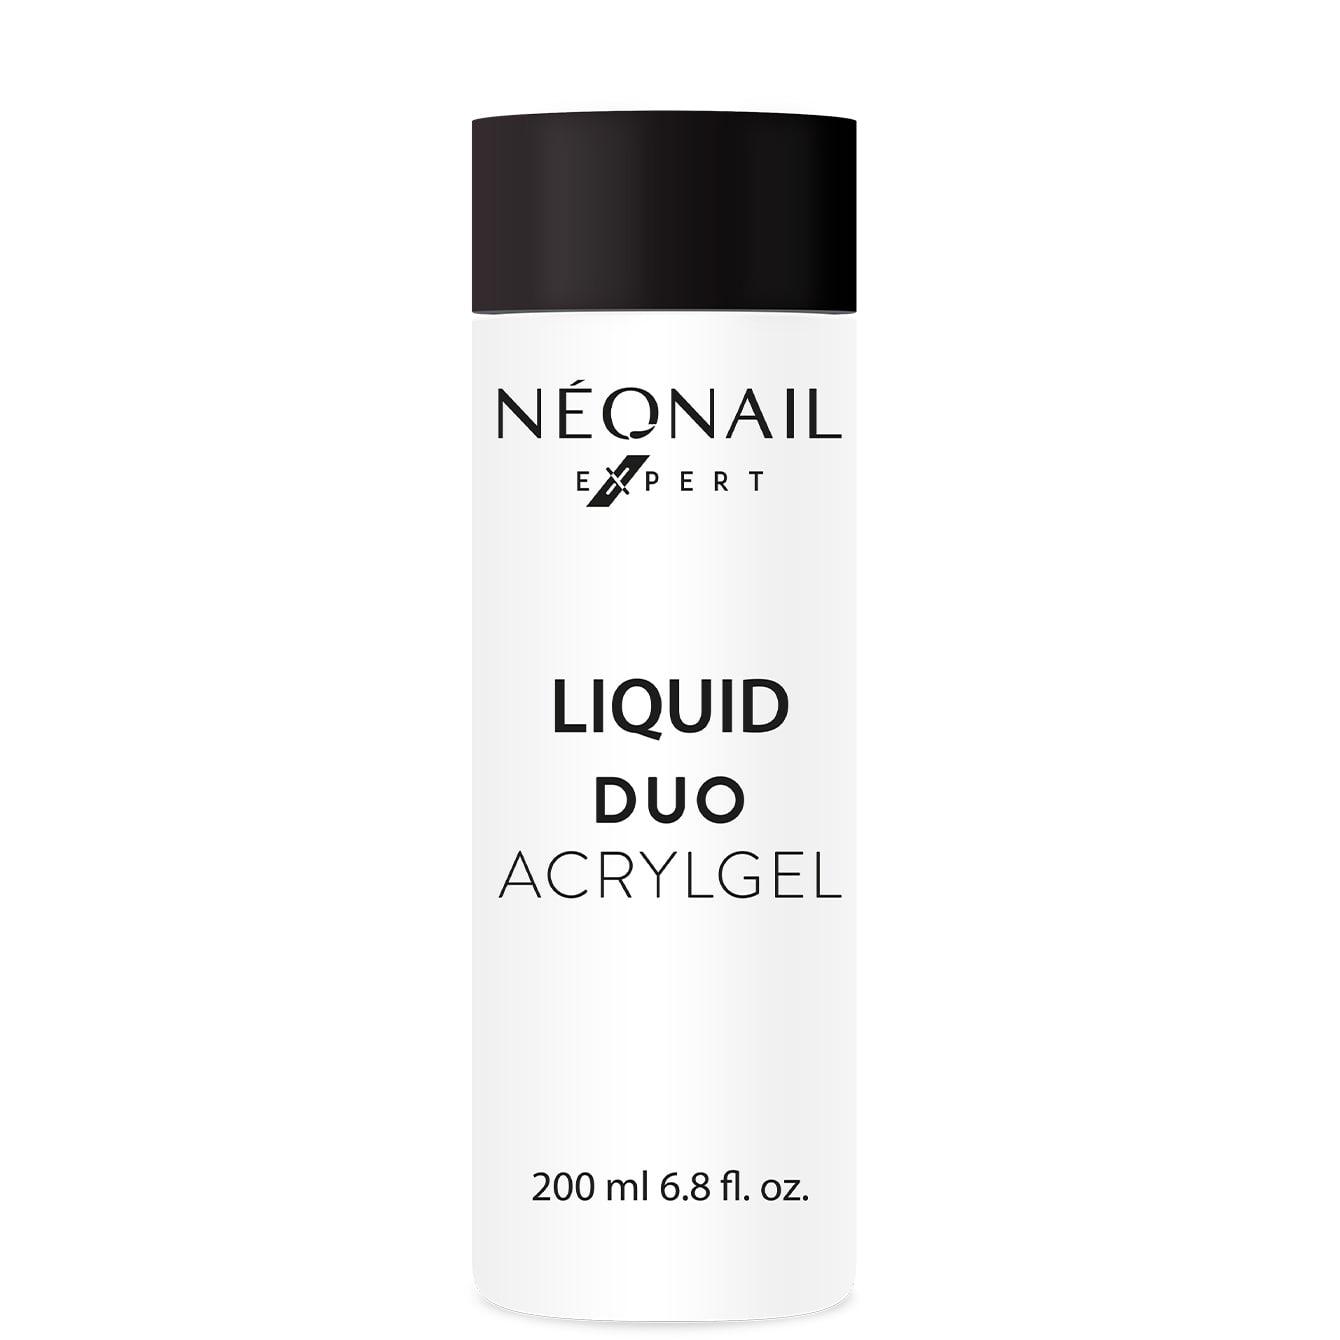 Skystis – Duo AcrylGel 200 ml